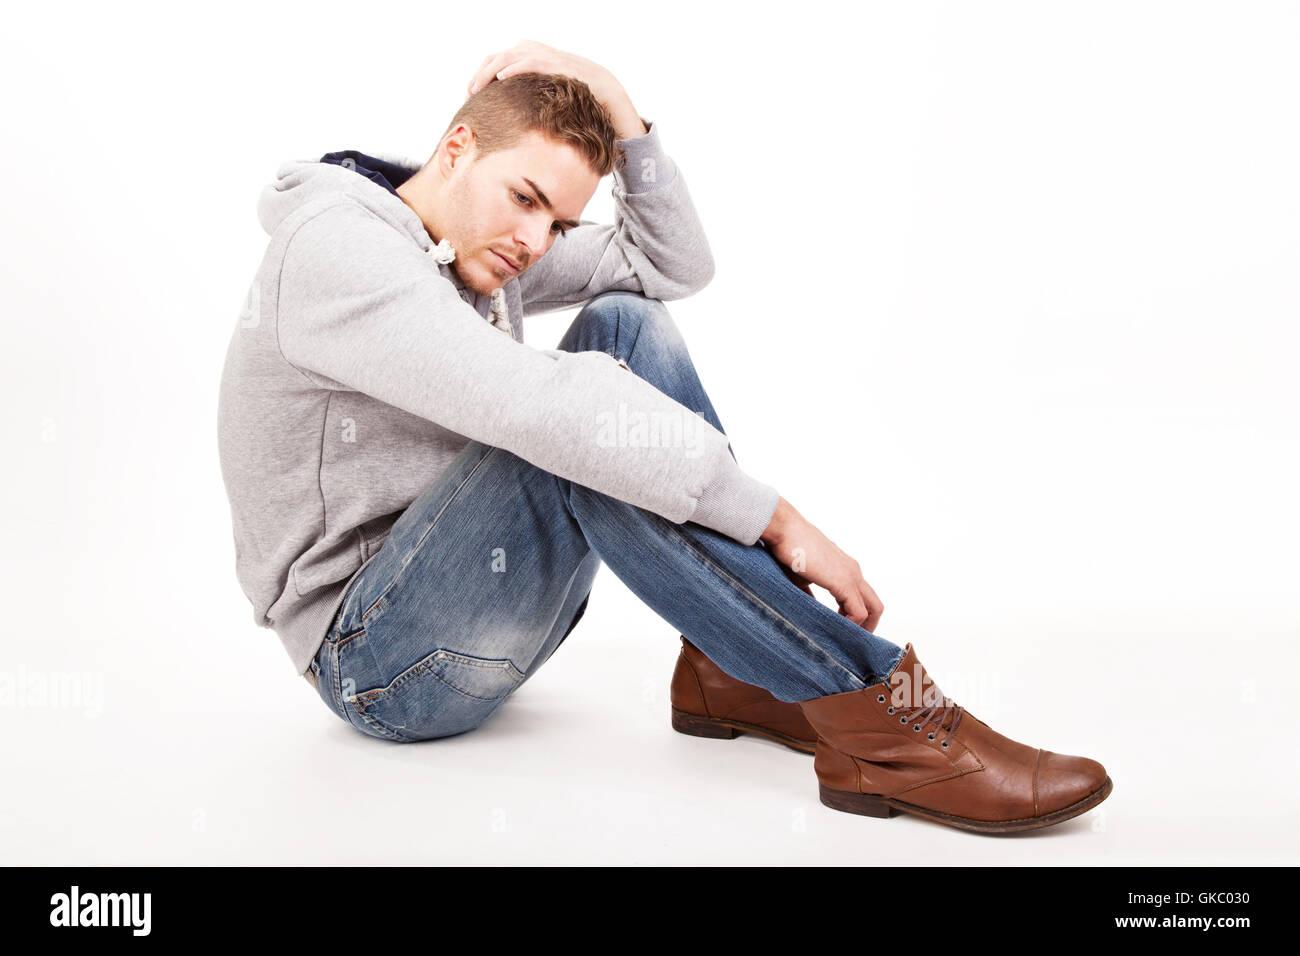 depressive young man - Stock Image